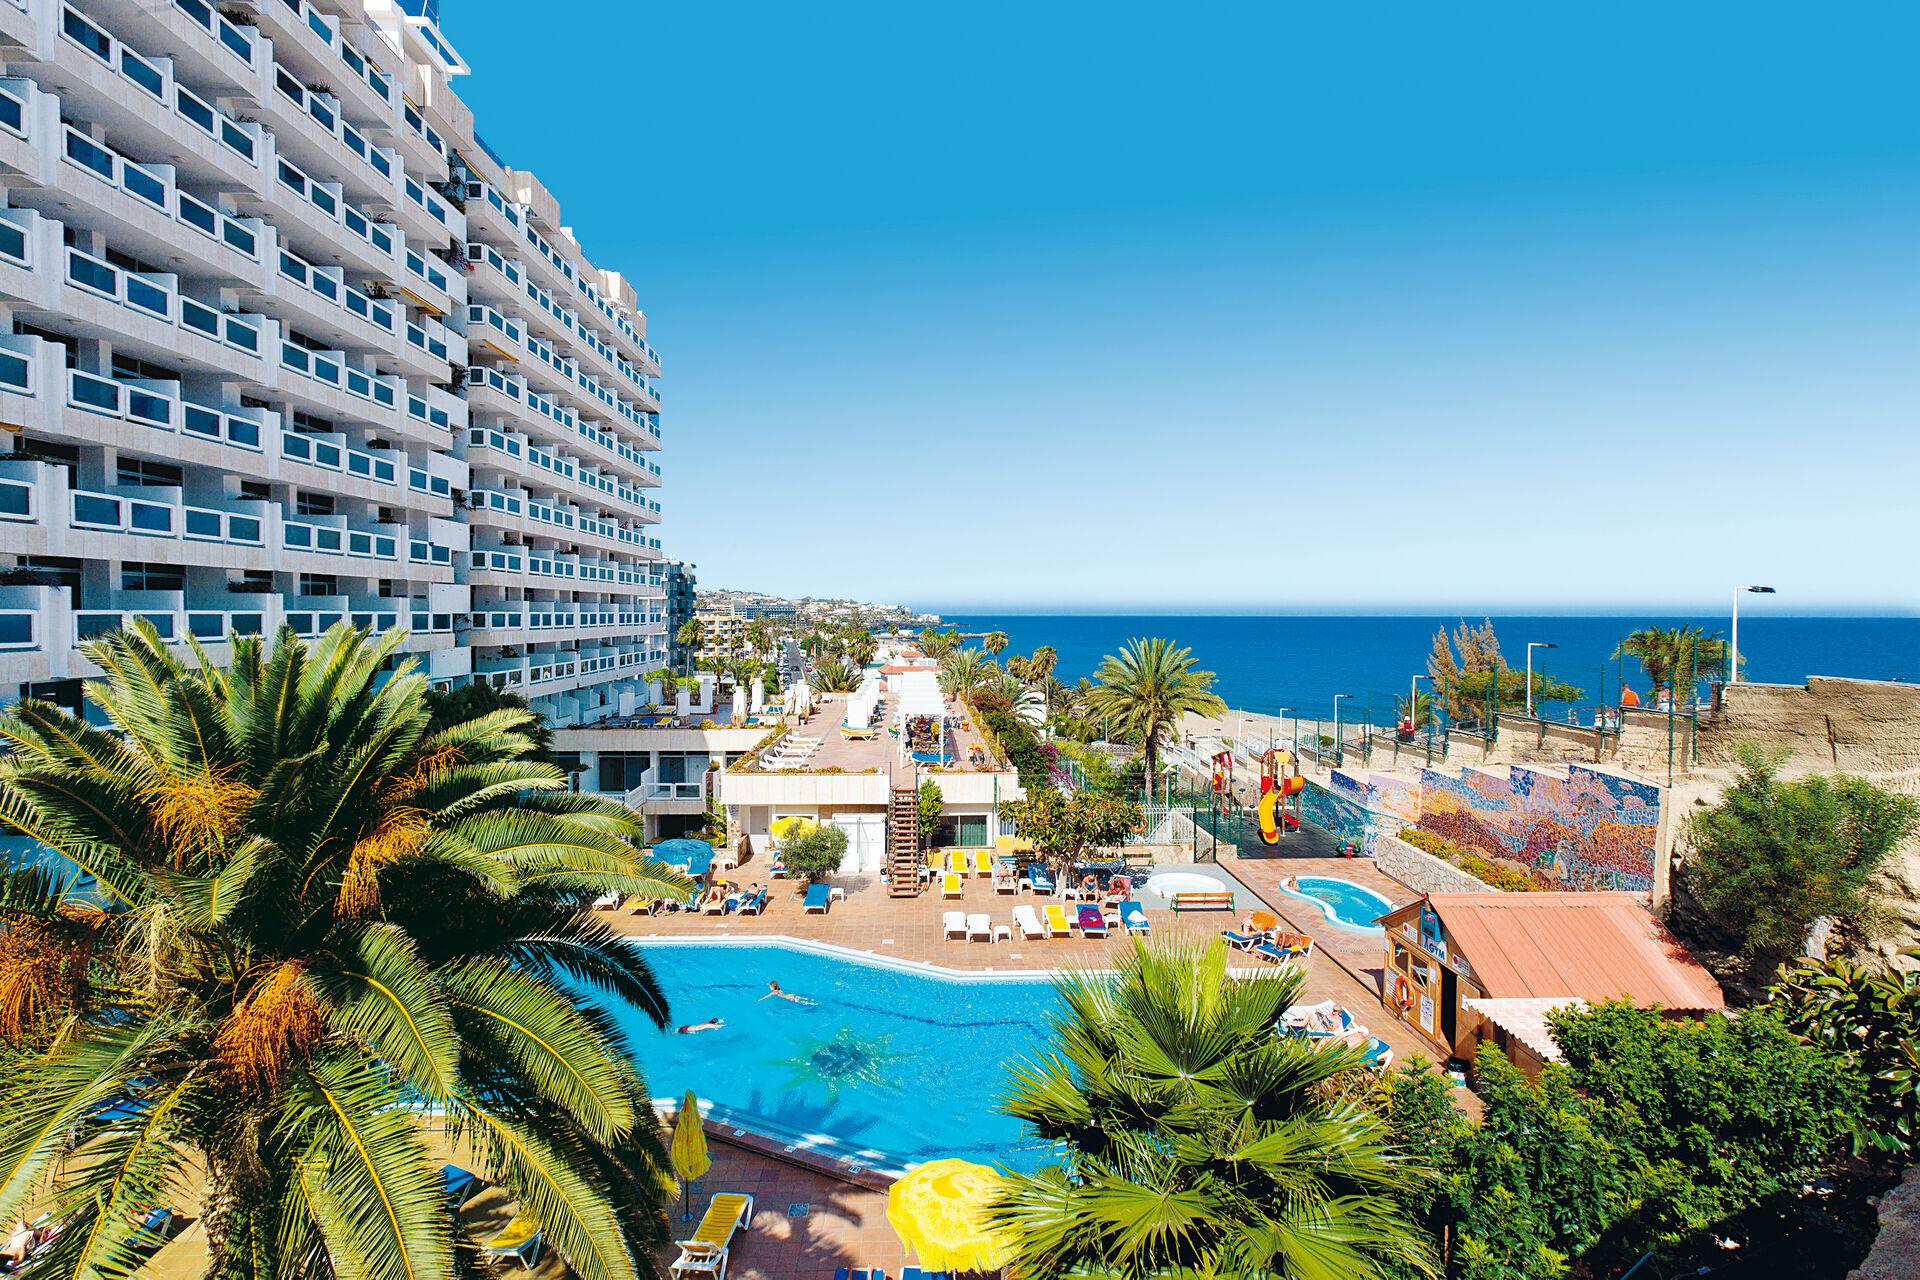 Séjour Las Palmas - Hotel Europalace - 3*